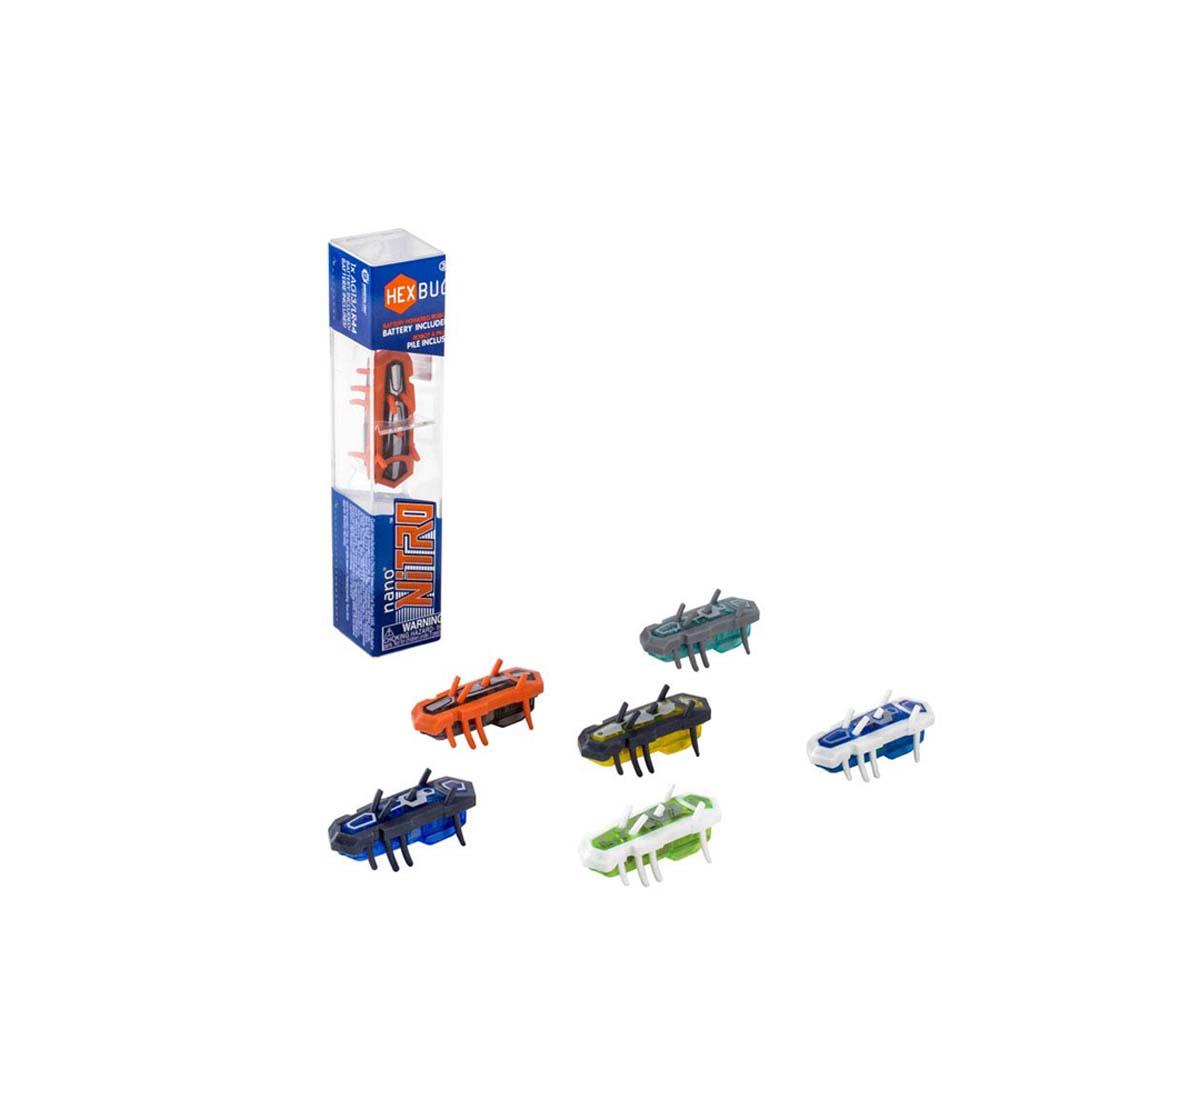 Hexbug   Hexbug Nitro Nano Single Assorted Robotics for Kids age 3Y+